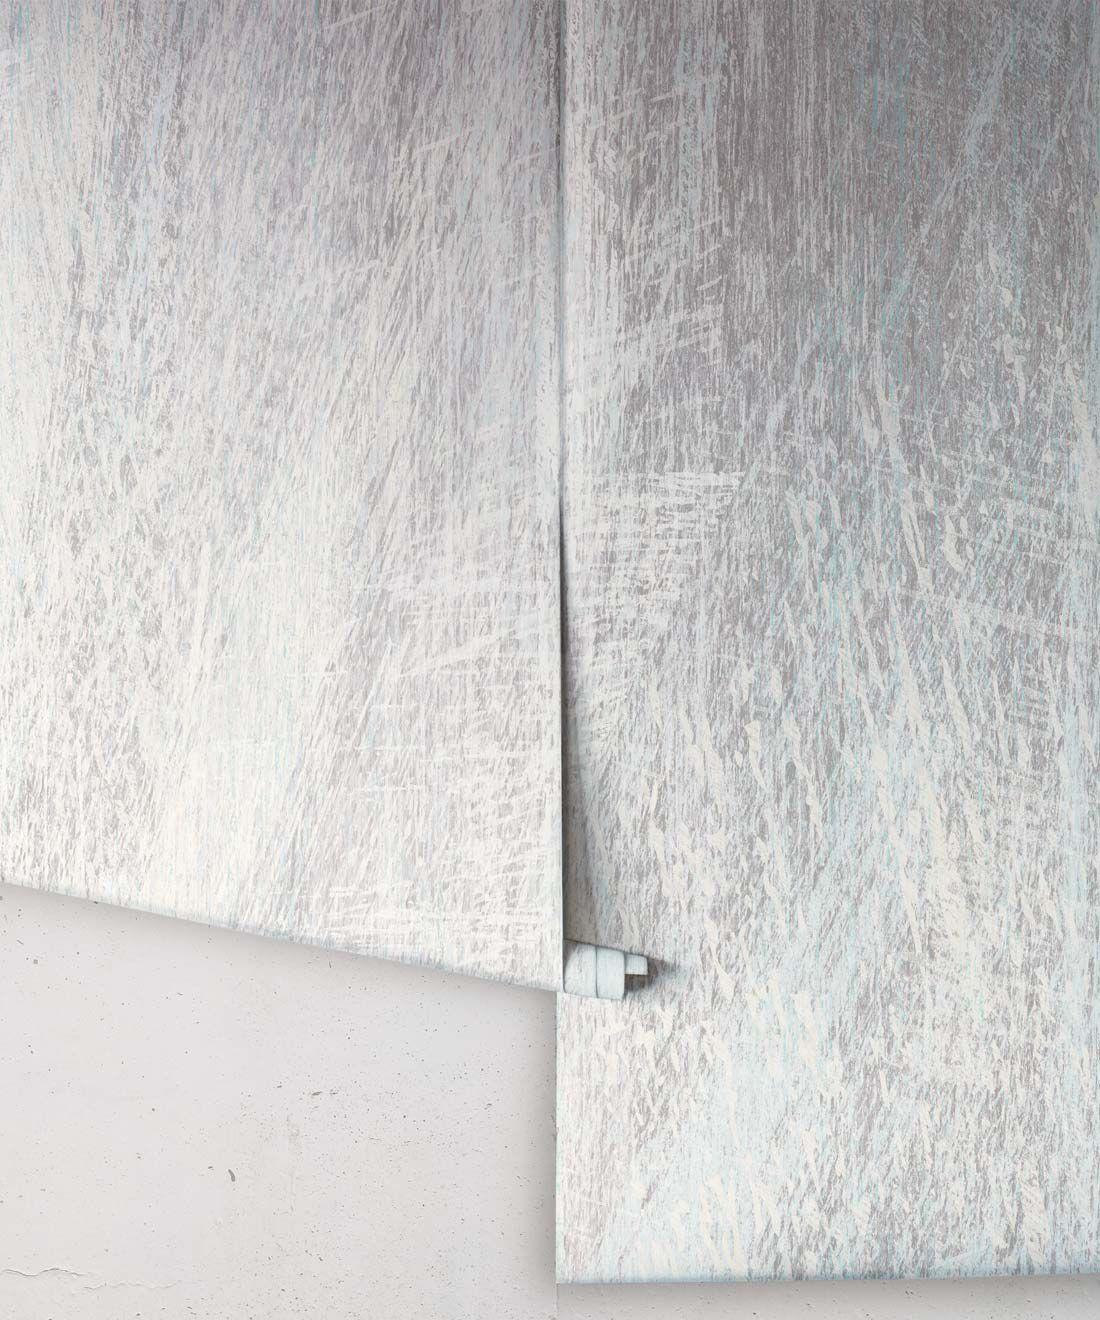 Shard Wallpaper by Simcox • Abstract Wallpaper • rolls